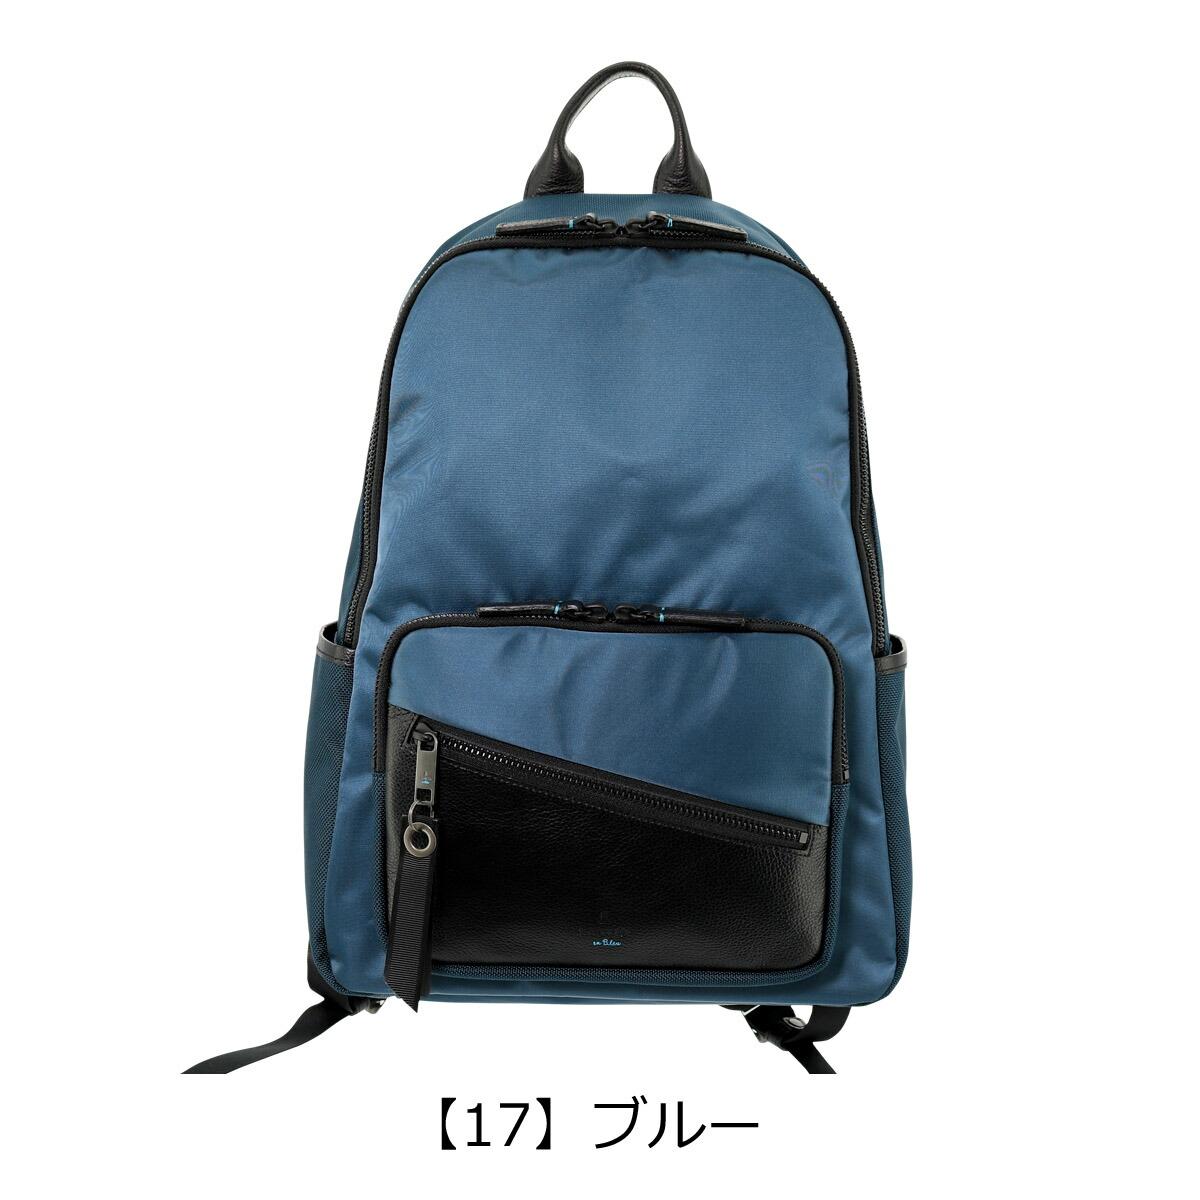 4b080cddac ランバンオンブルー リュック フェリックス メンズ 564721 日本製 LANVIN ...